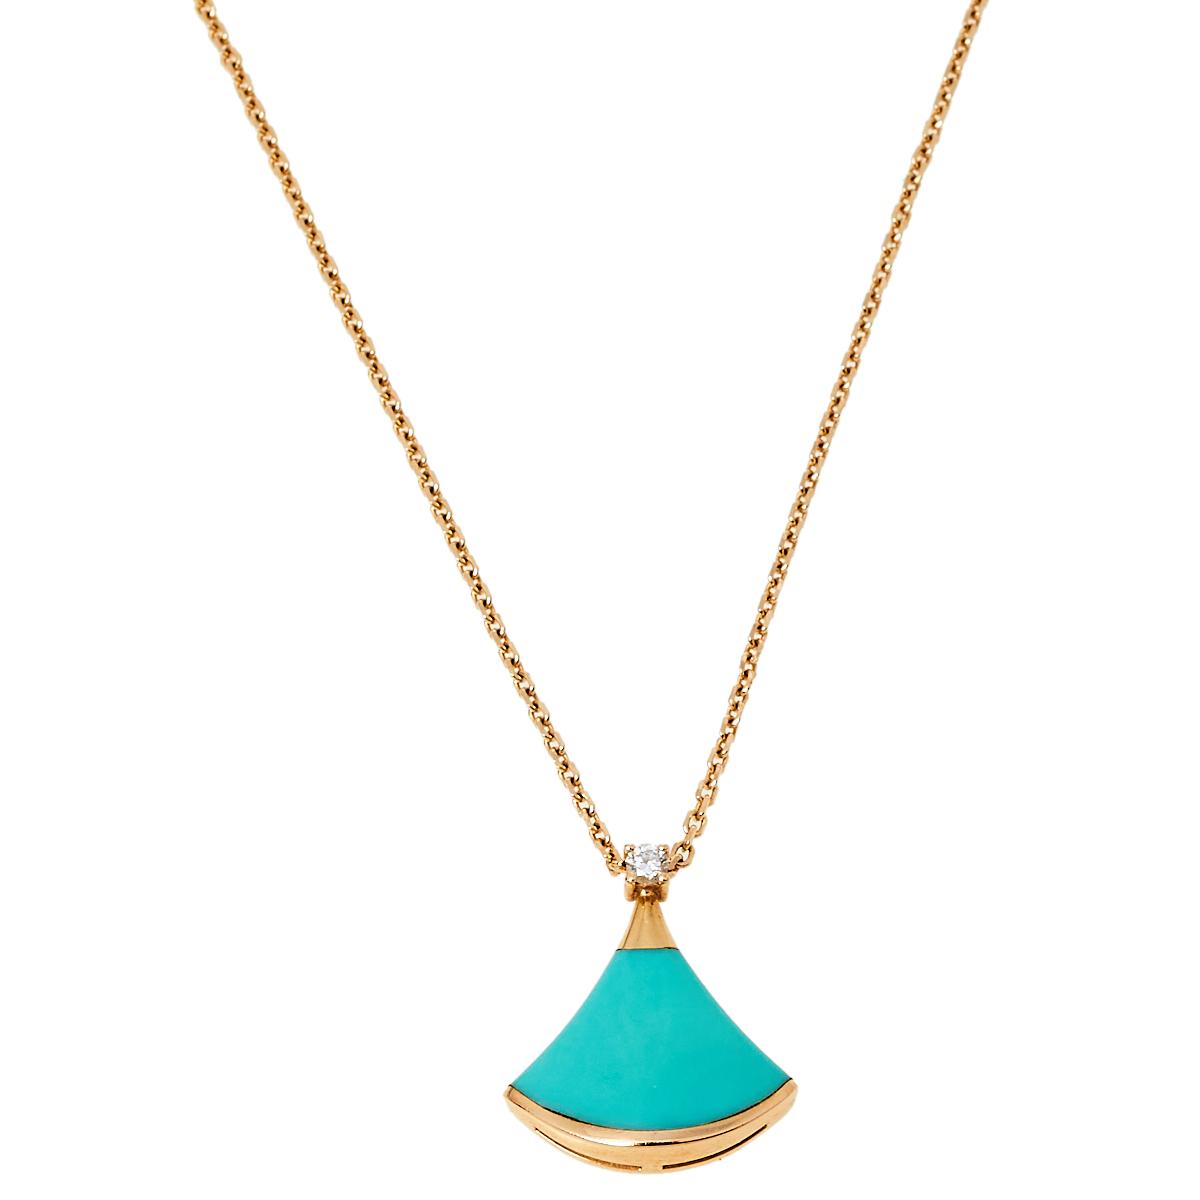 Pre-owned Bvlgari Divas' Dream Turquoise Diamond 18k Rose Gold Pendant Necklace